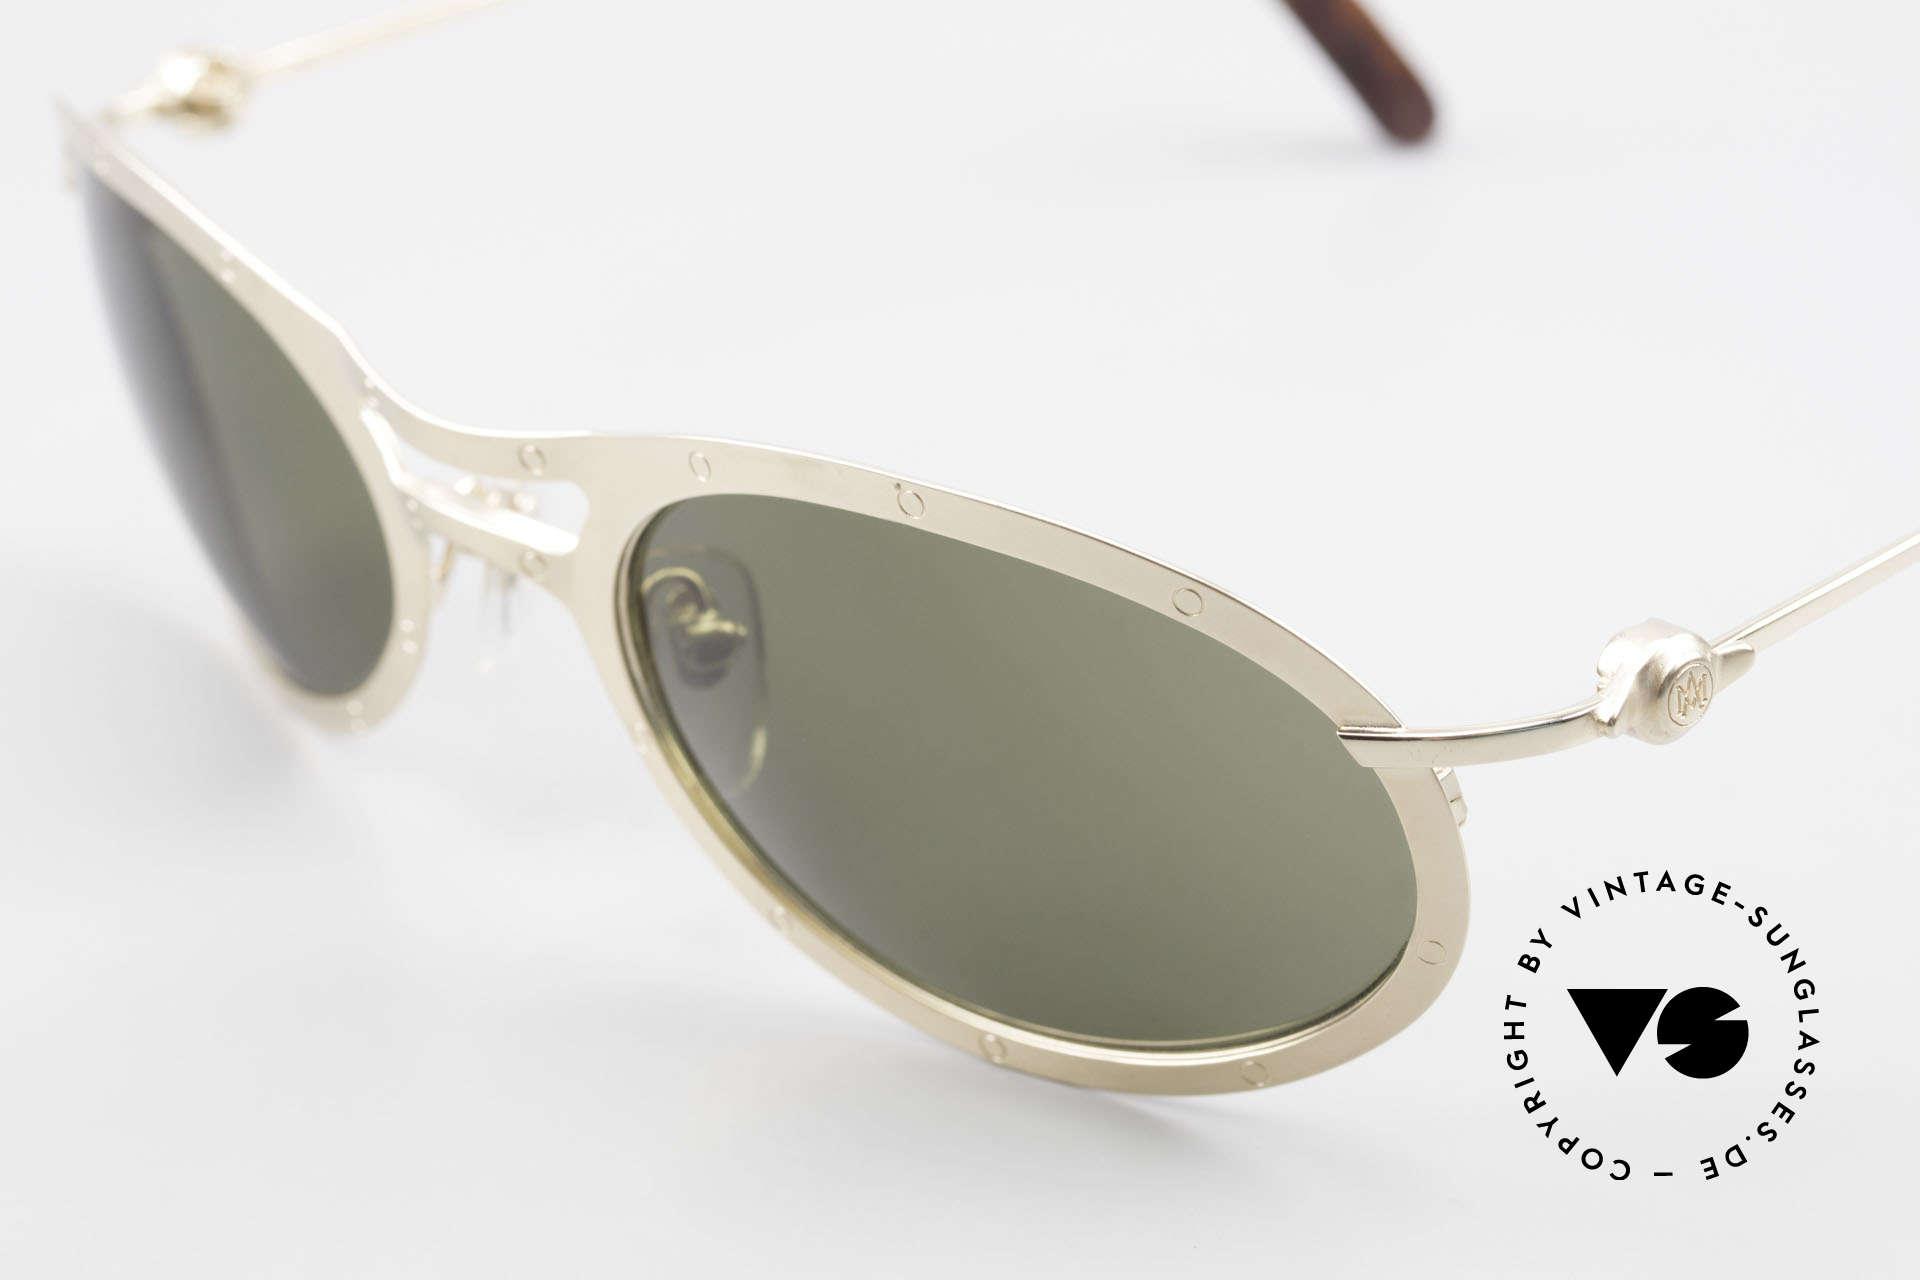 Aston Martin AM33 Sporty Luxury Sunglasses 90's, precious rarity in TOP-quality + orig. Aston Marin case, Made for Men